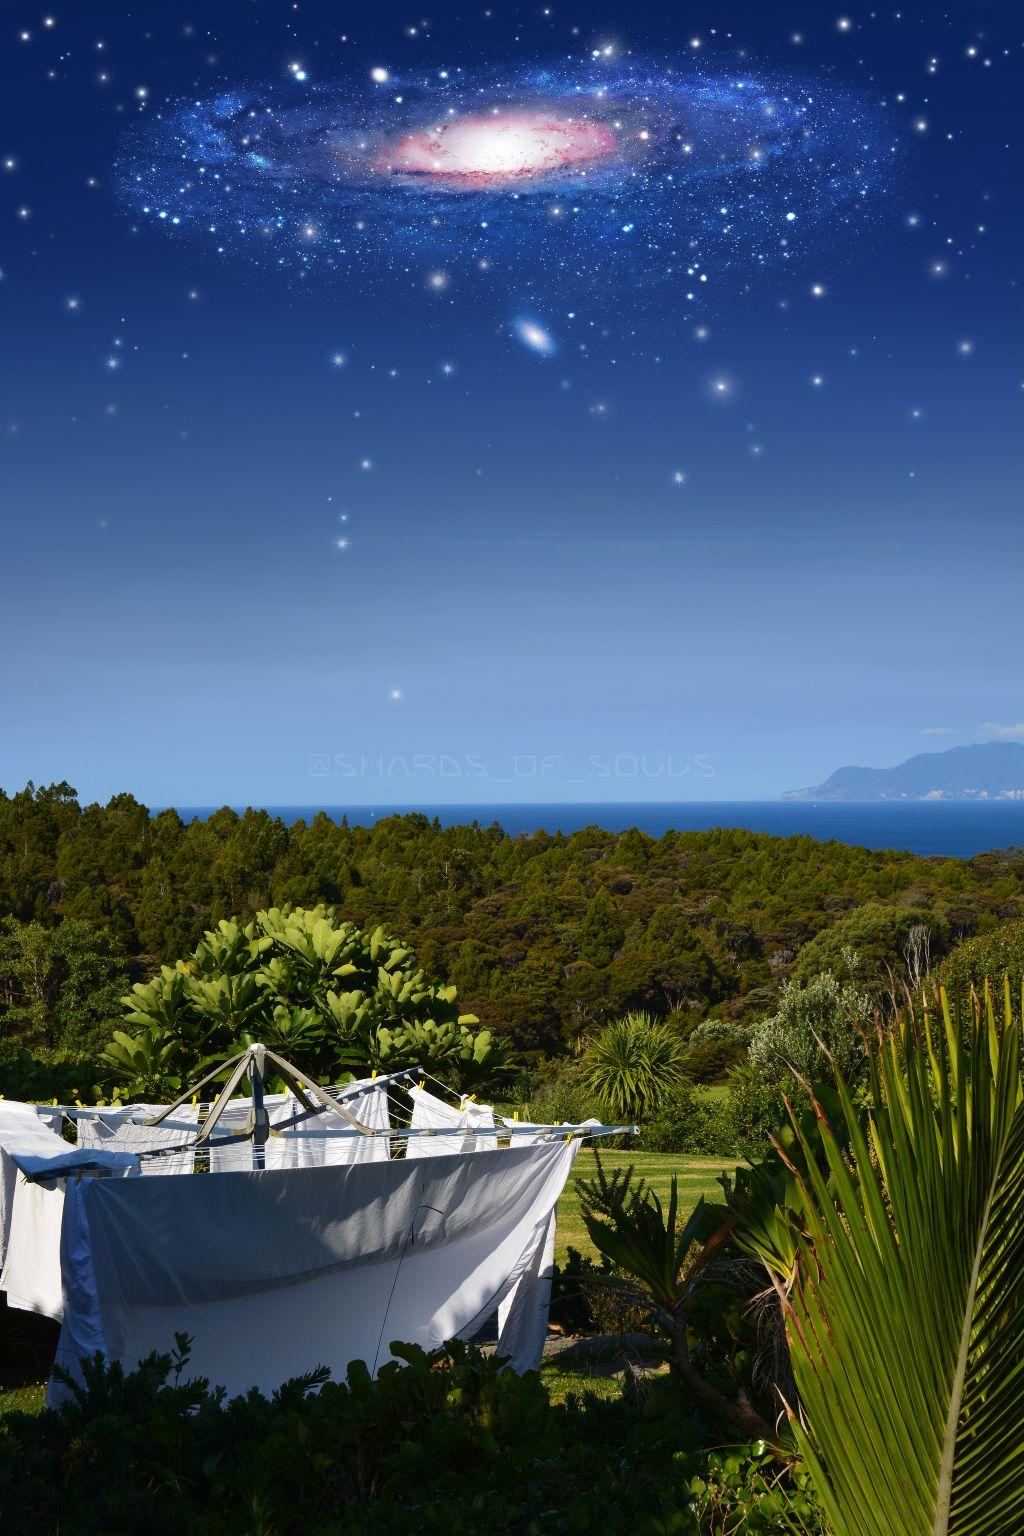 #sky #stars #blue #ocean #trees #horizon #newzealand #nz #travel #milkyway #galaxy #nature #freetoedit #myphoto #myedit #summer #sea